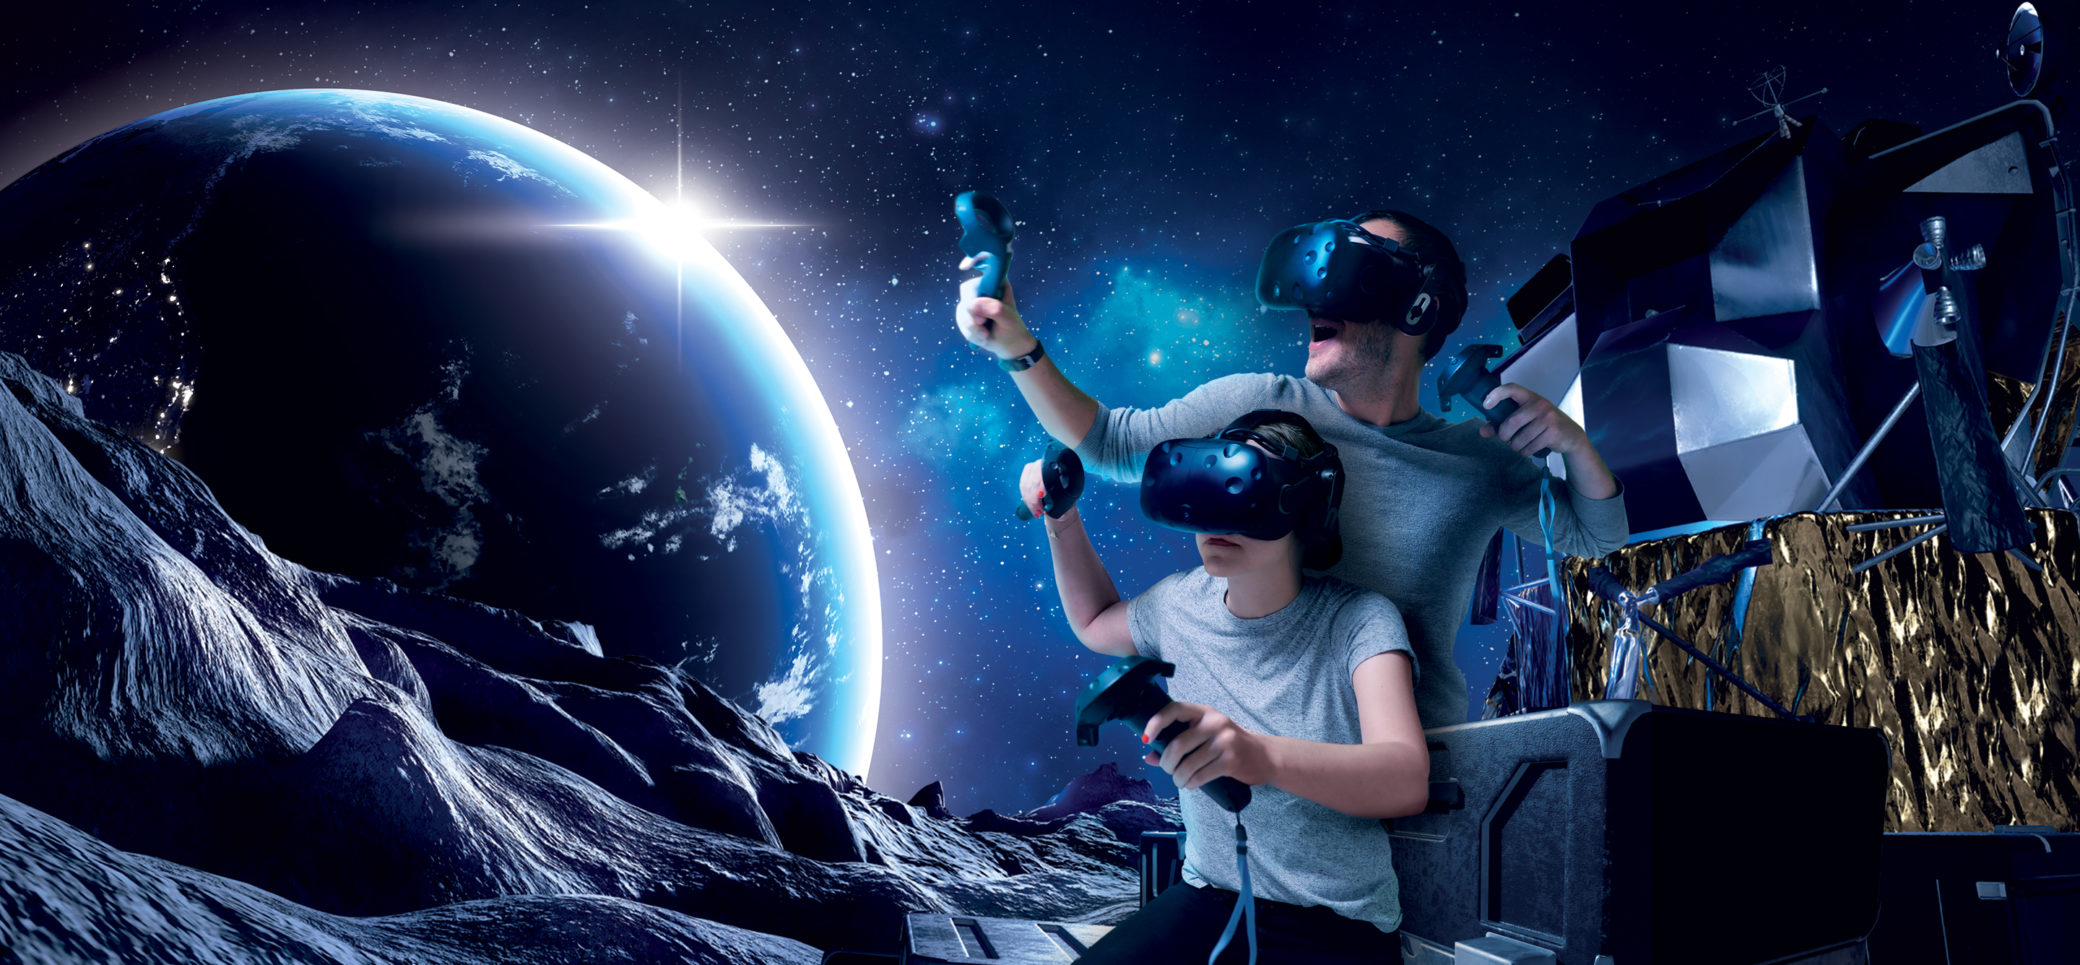 Virtual Room 1 232 Re Aventure De R 233 Alit 233 Virtuelle Vr